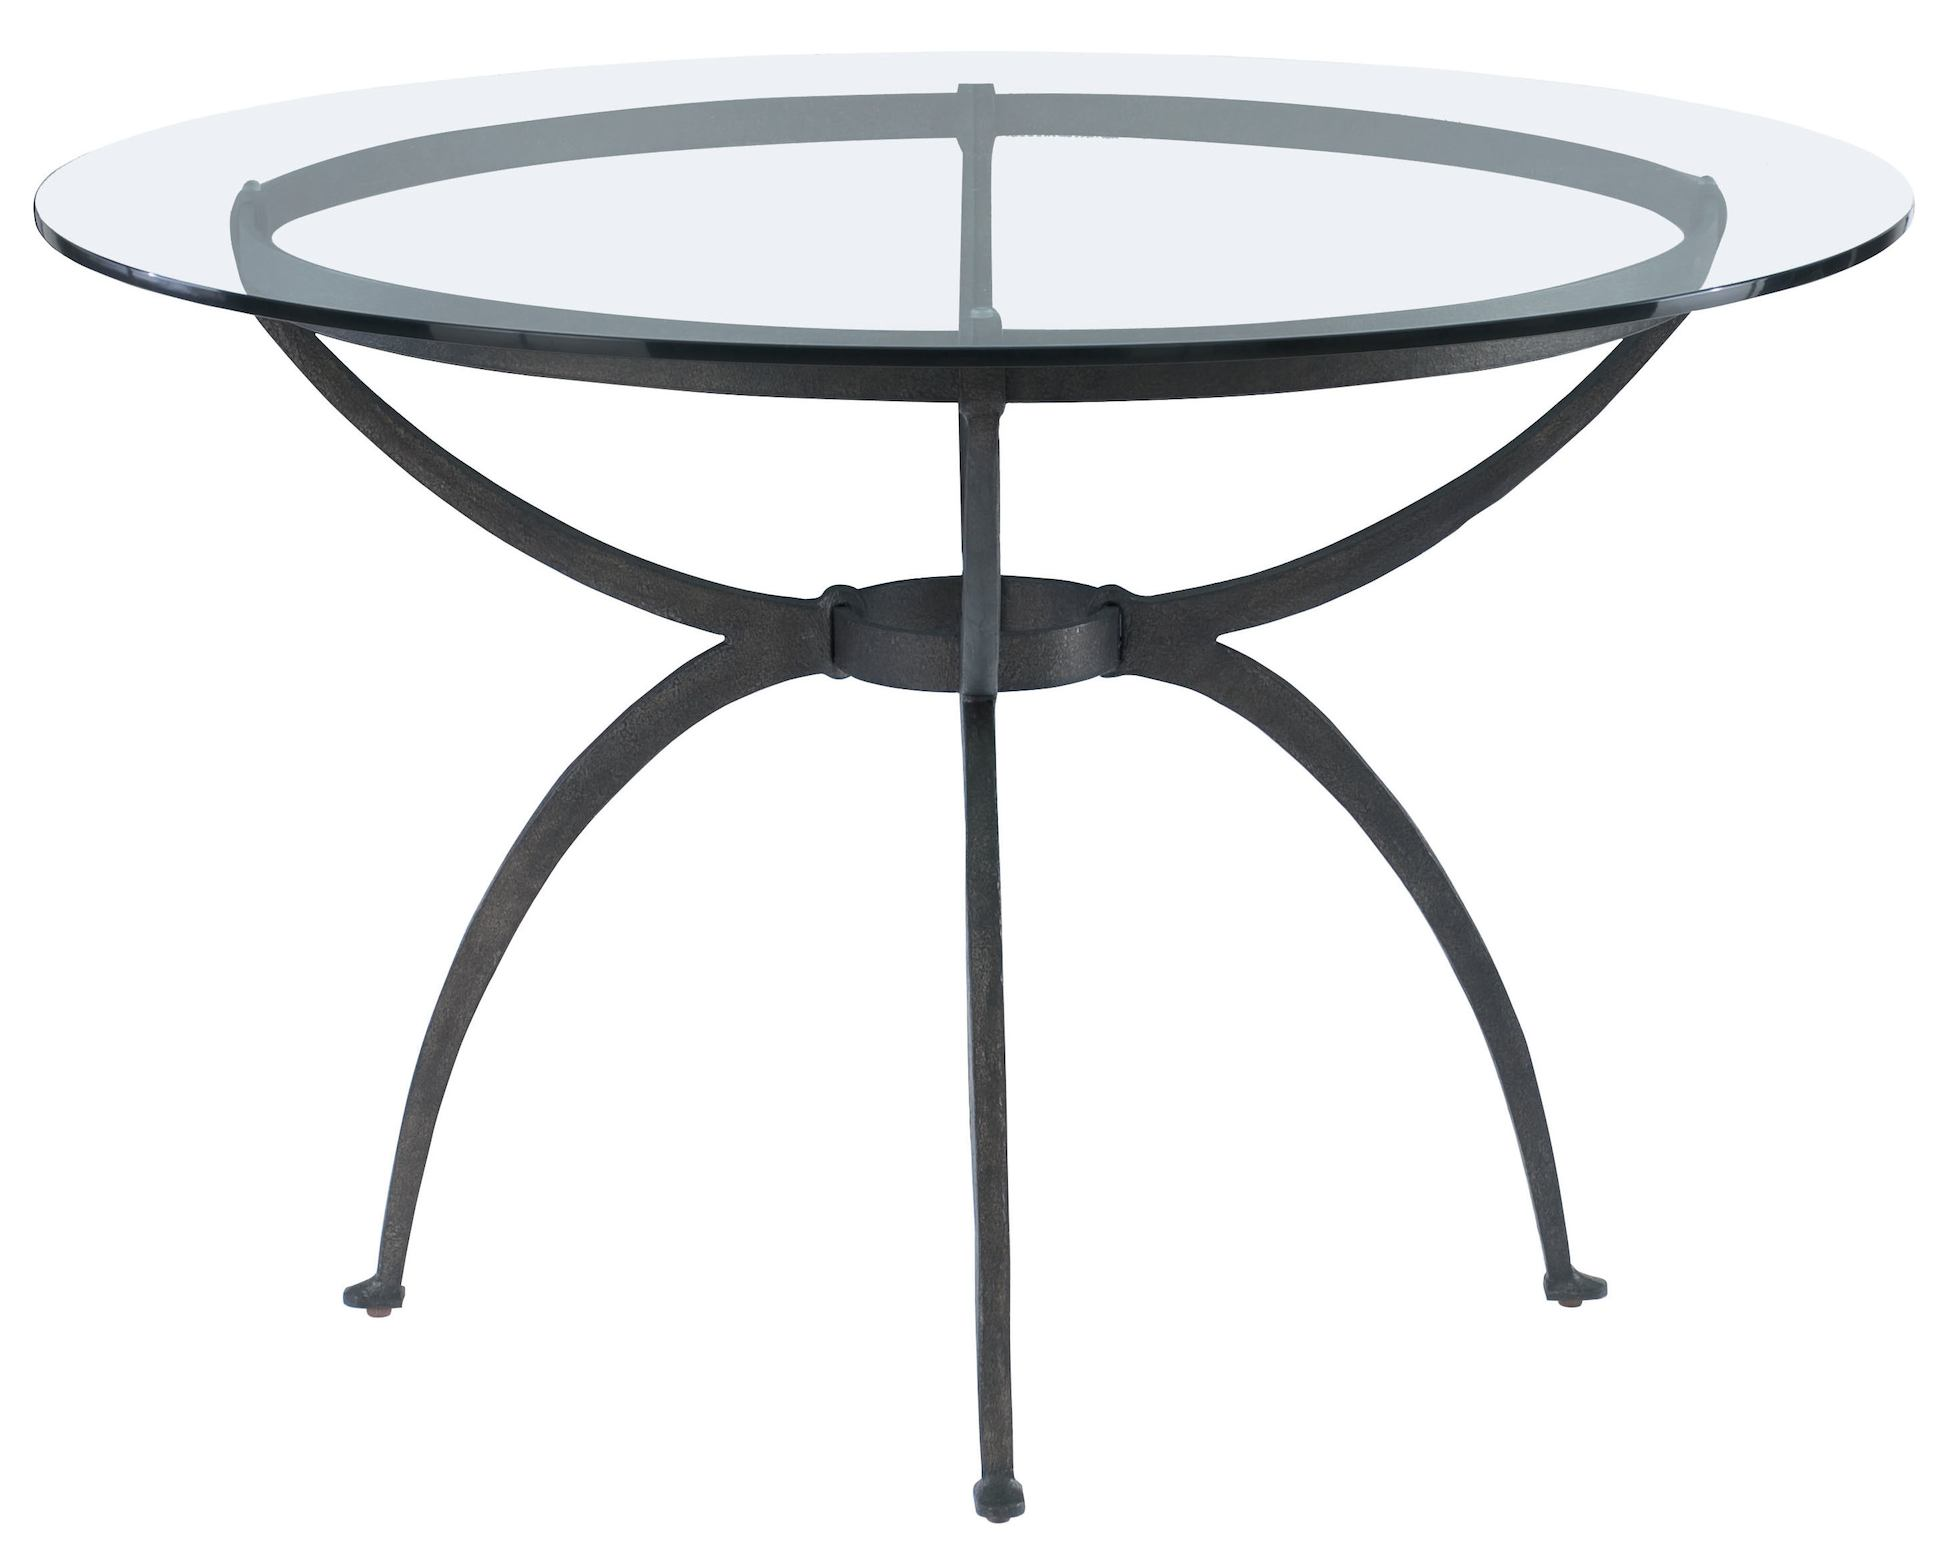 Round Glass Tables For Kitchen Metal Top Kitchen Table Designalicious